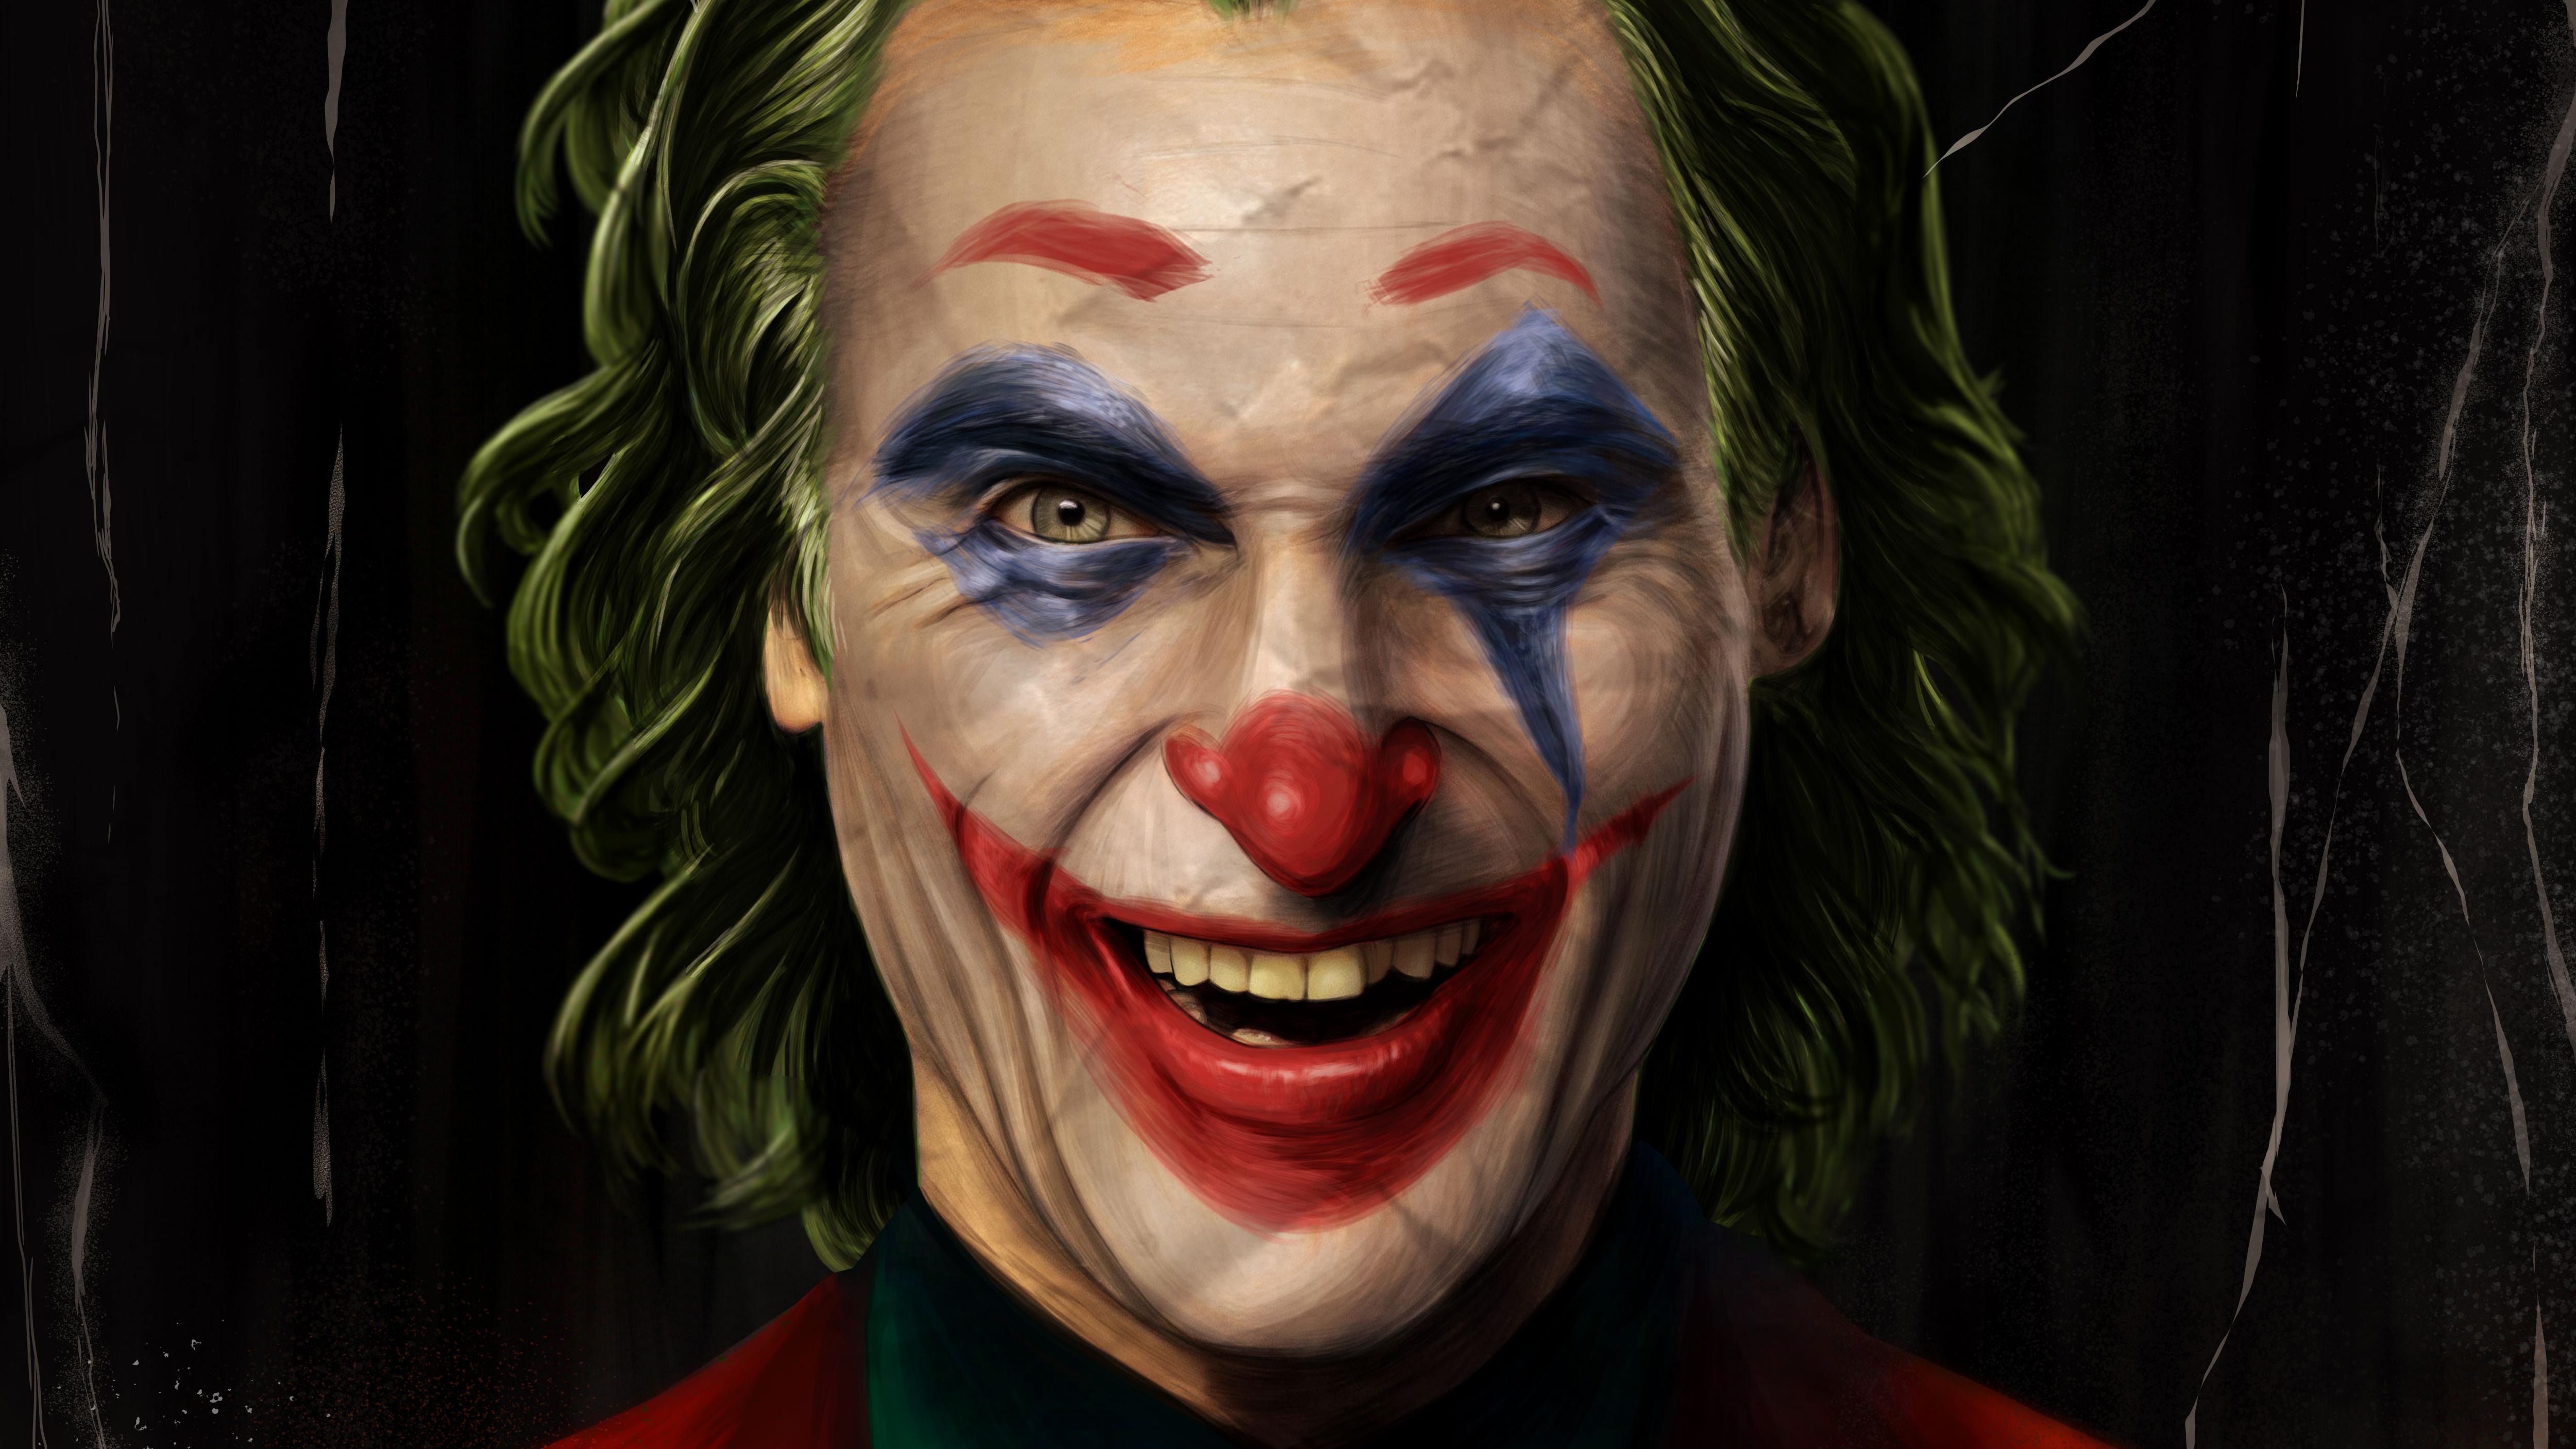 5k Joker Joaquin Phoenix 2019 Hd Movies 4k Wallpapers